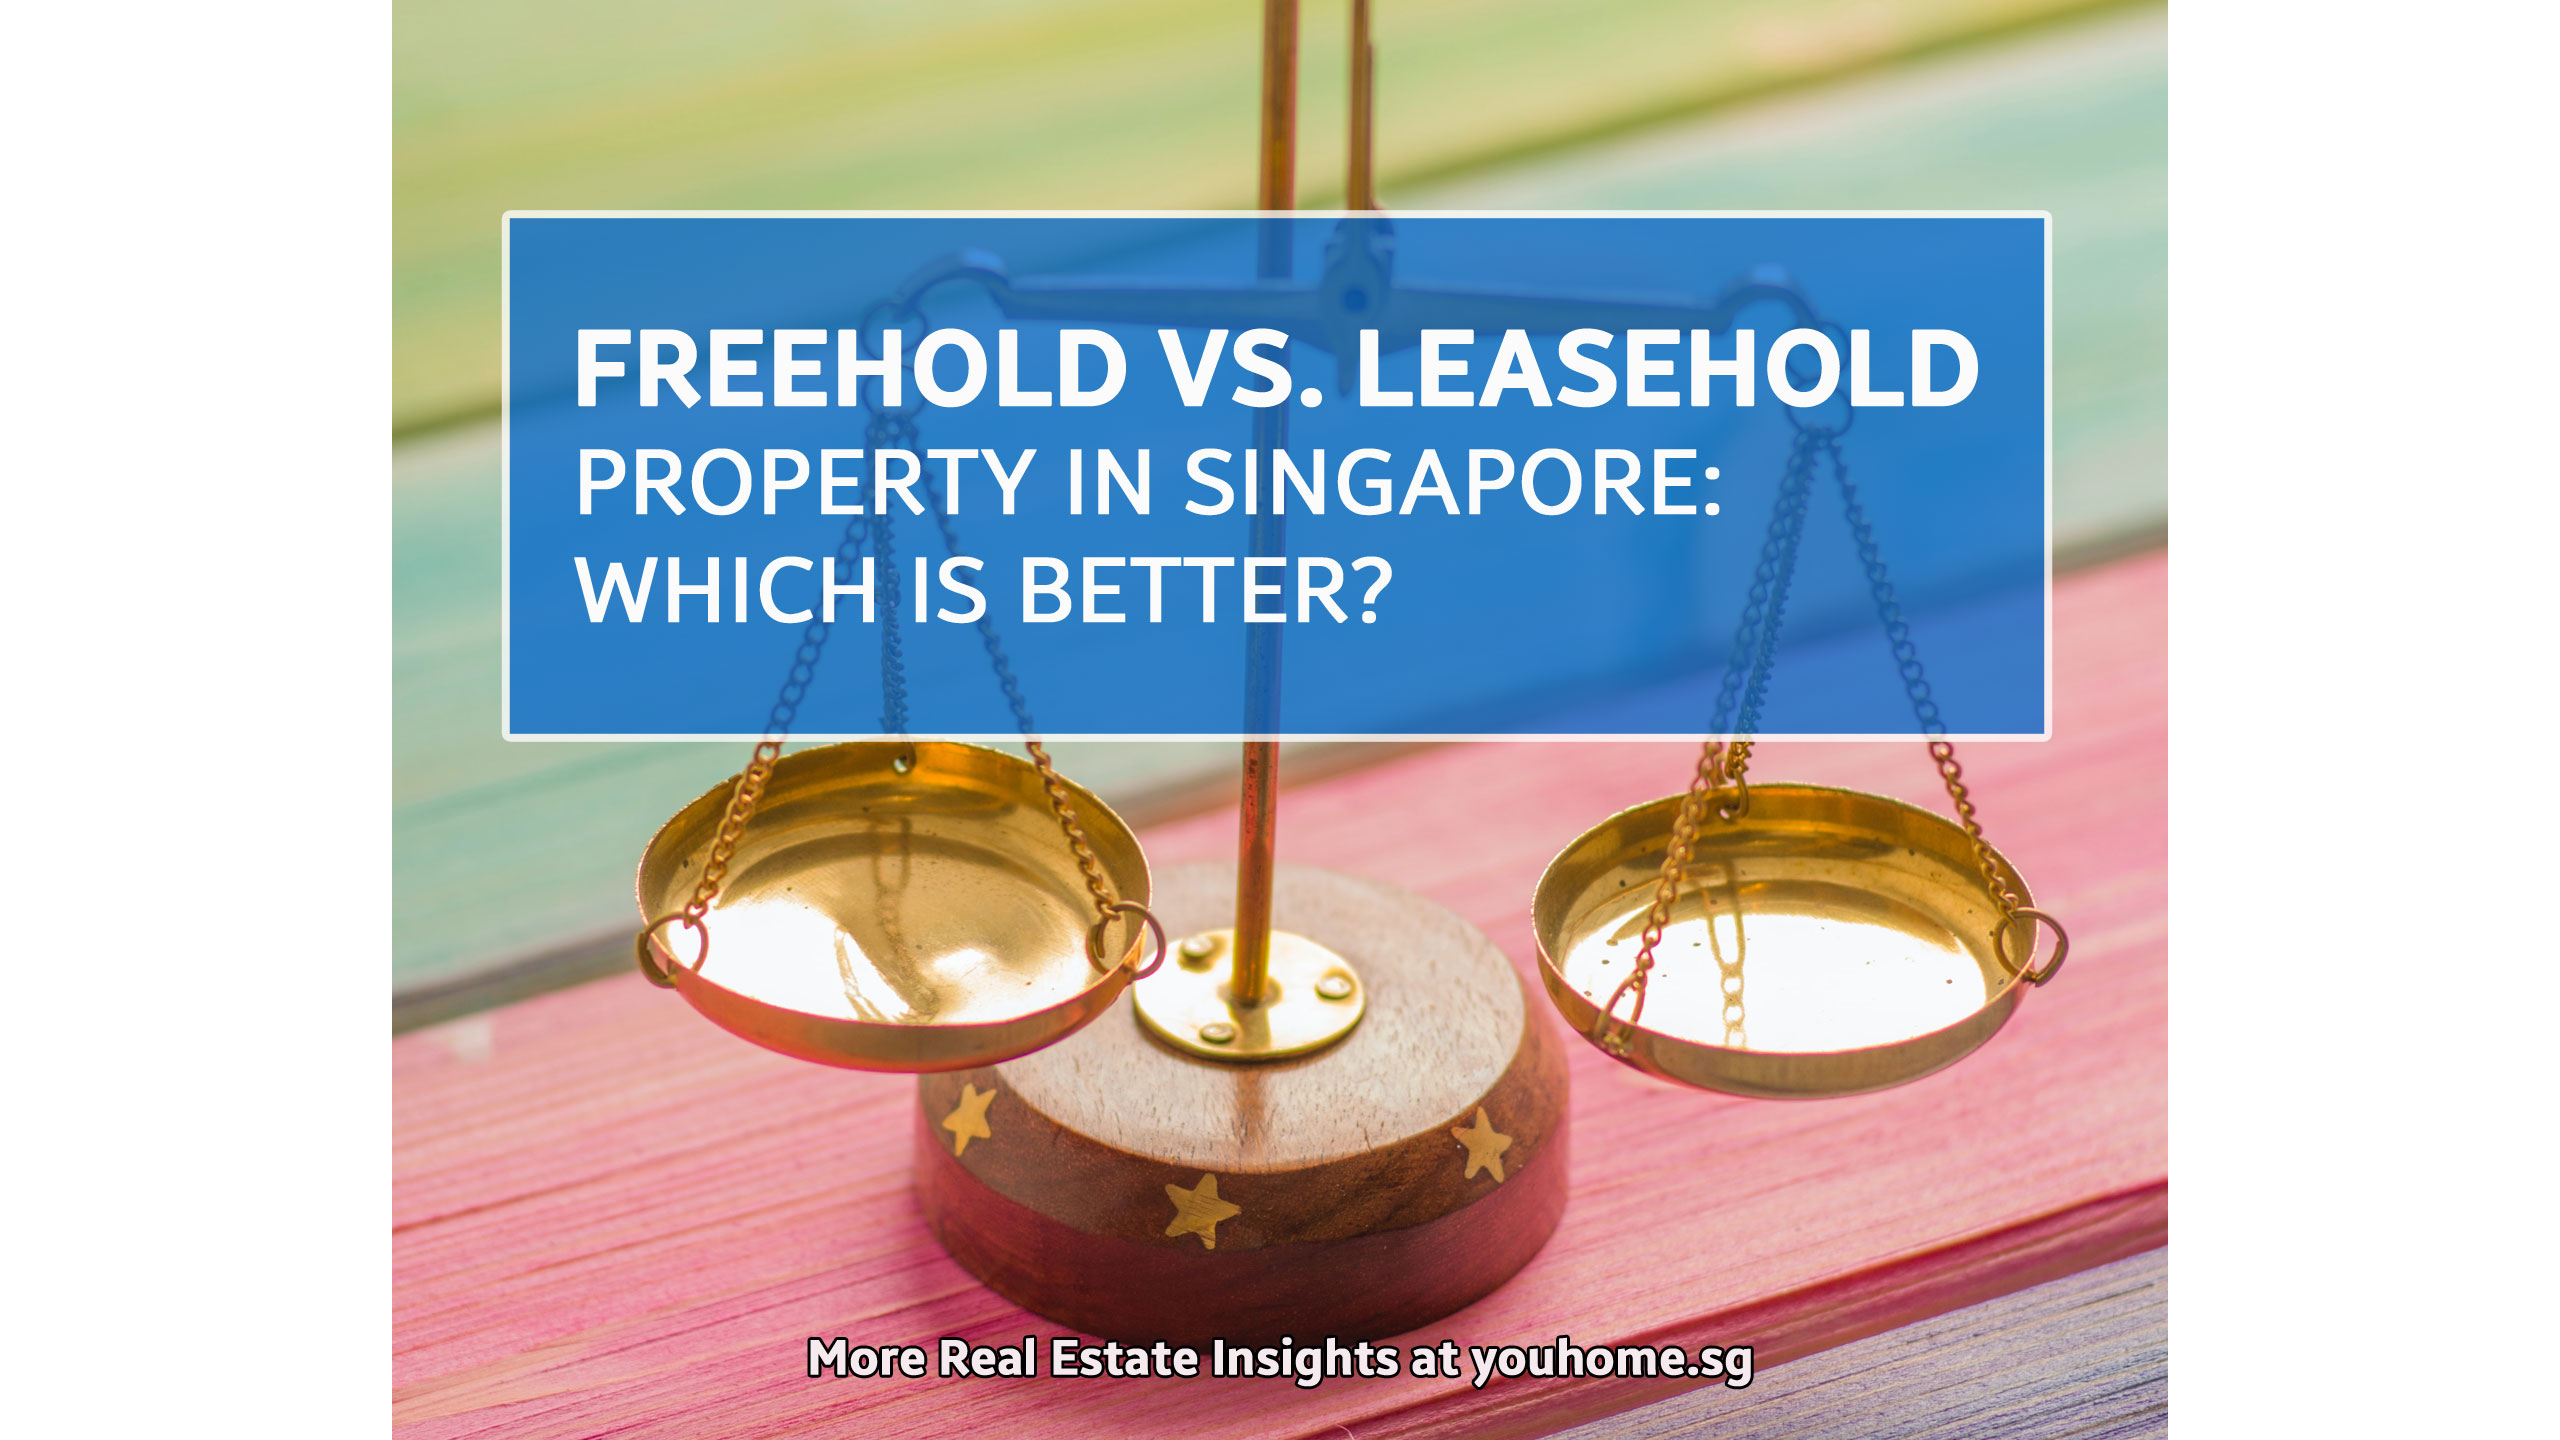 freehold-vs-leasehold-singapore